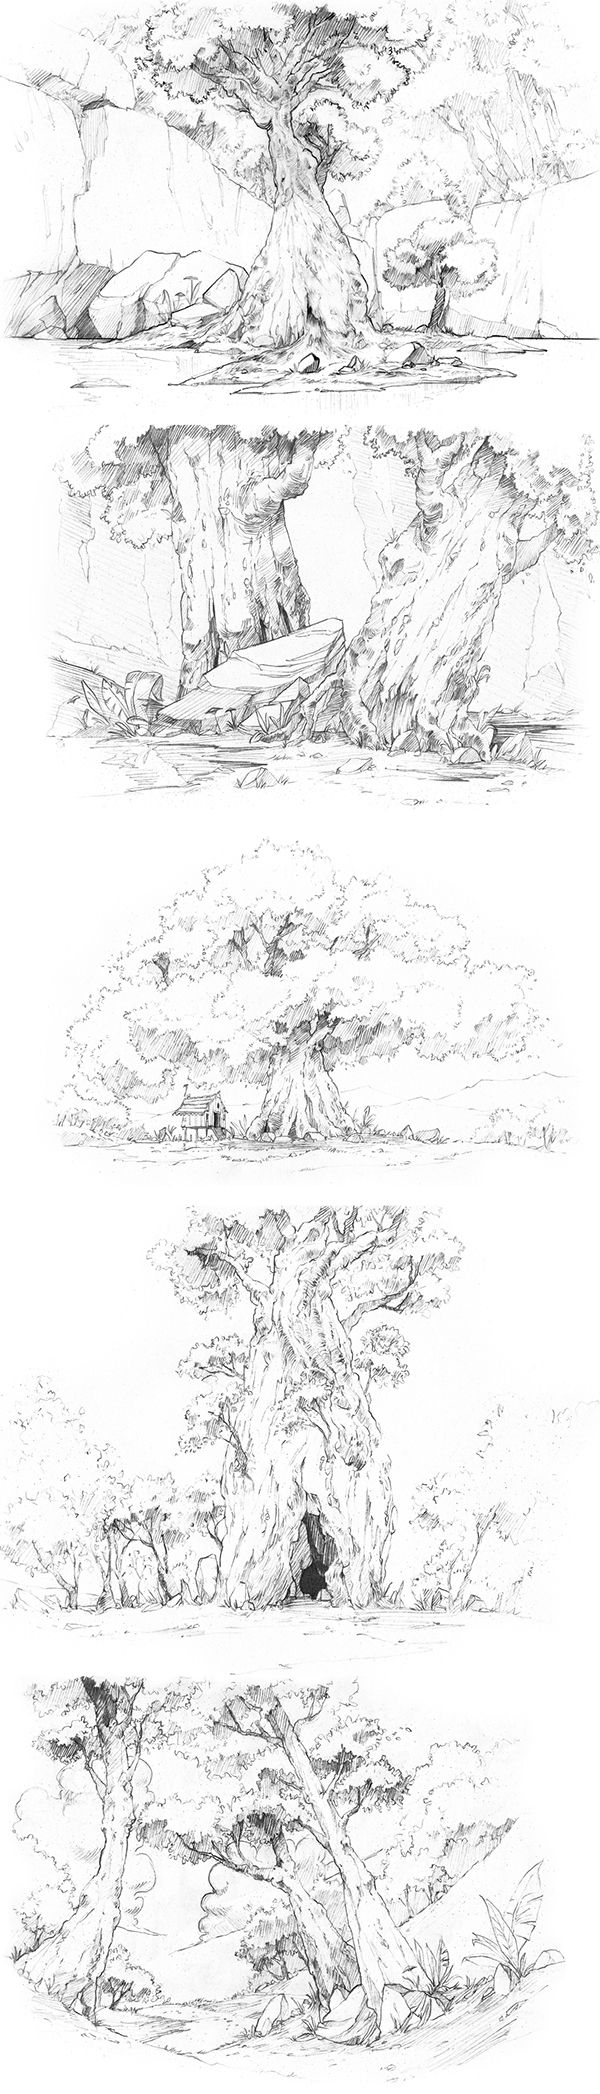 https://www.behance.net/gallery/21698179/Tree-collection